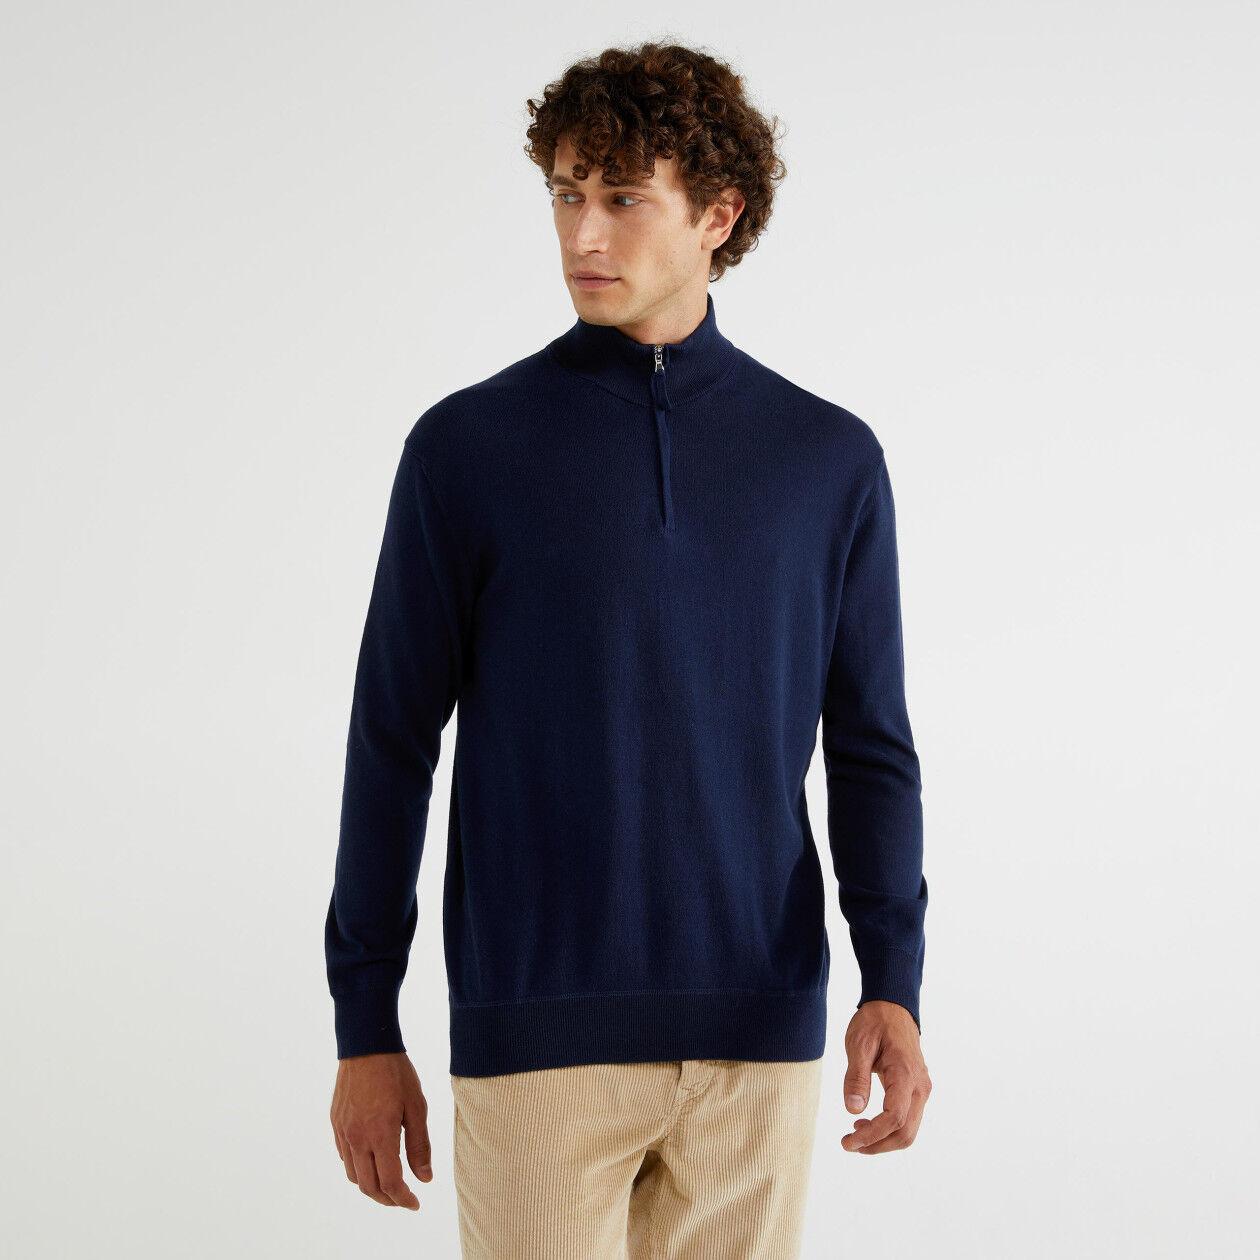 Jersey de cuello alto con cremallera